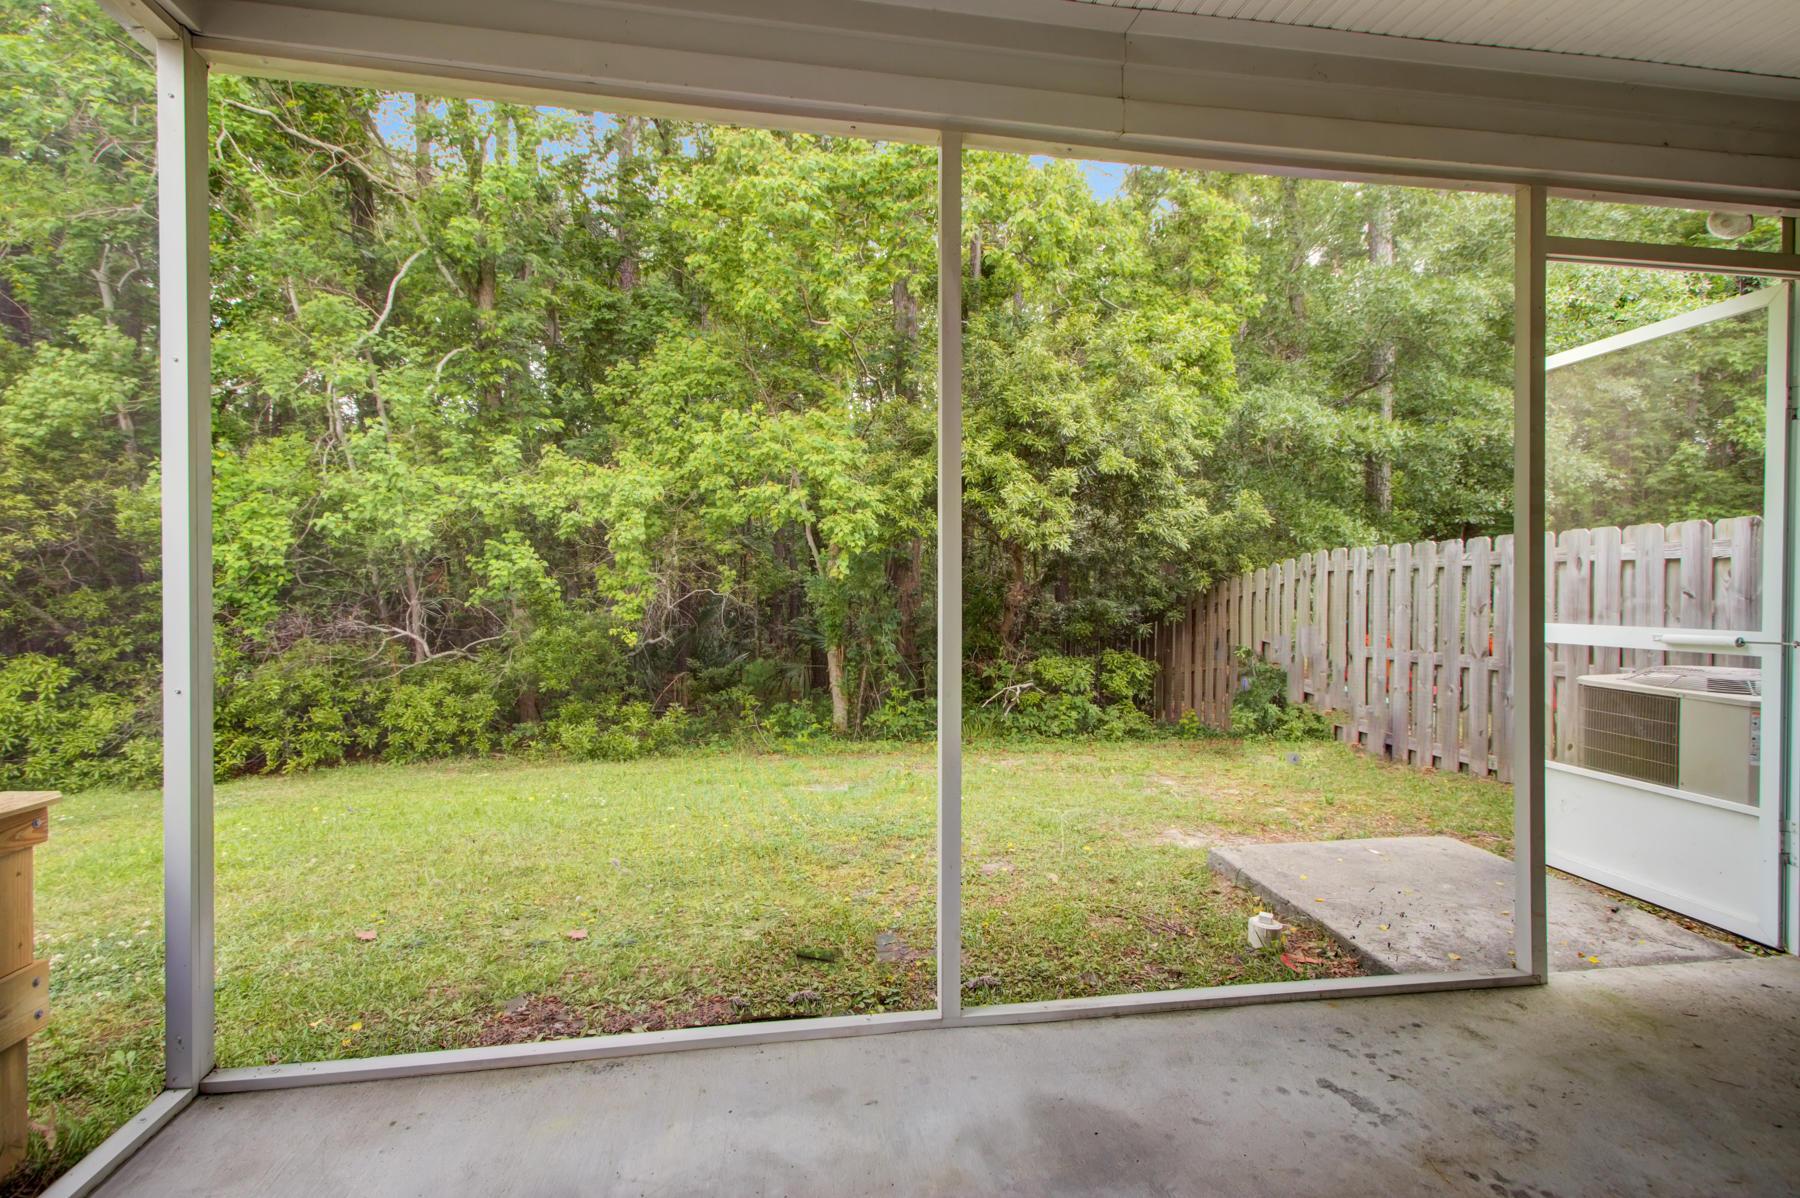 Dunes West Homes For Sale - 2232 Kings Gate, Mount Pleasant, SC - 9